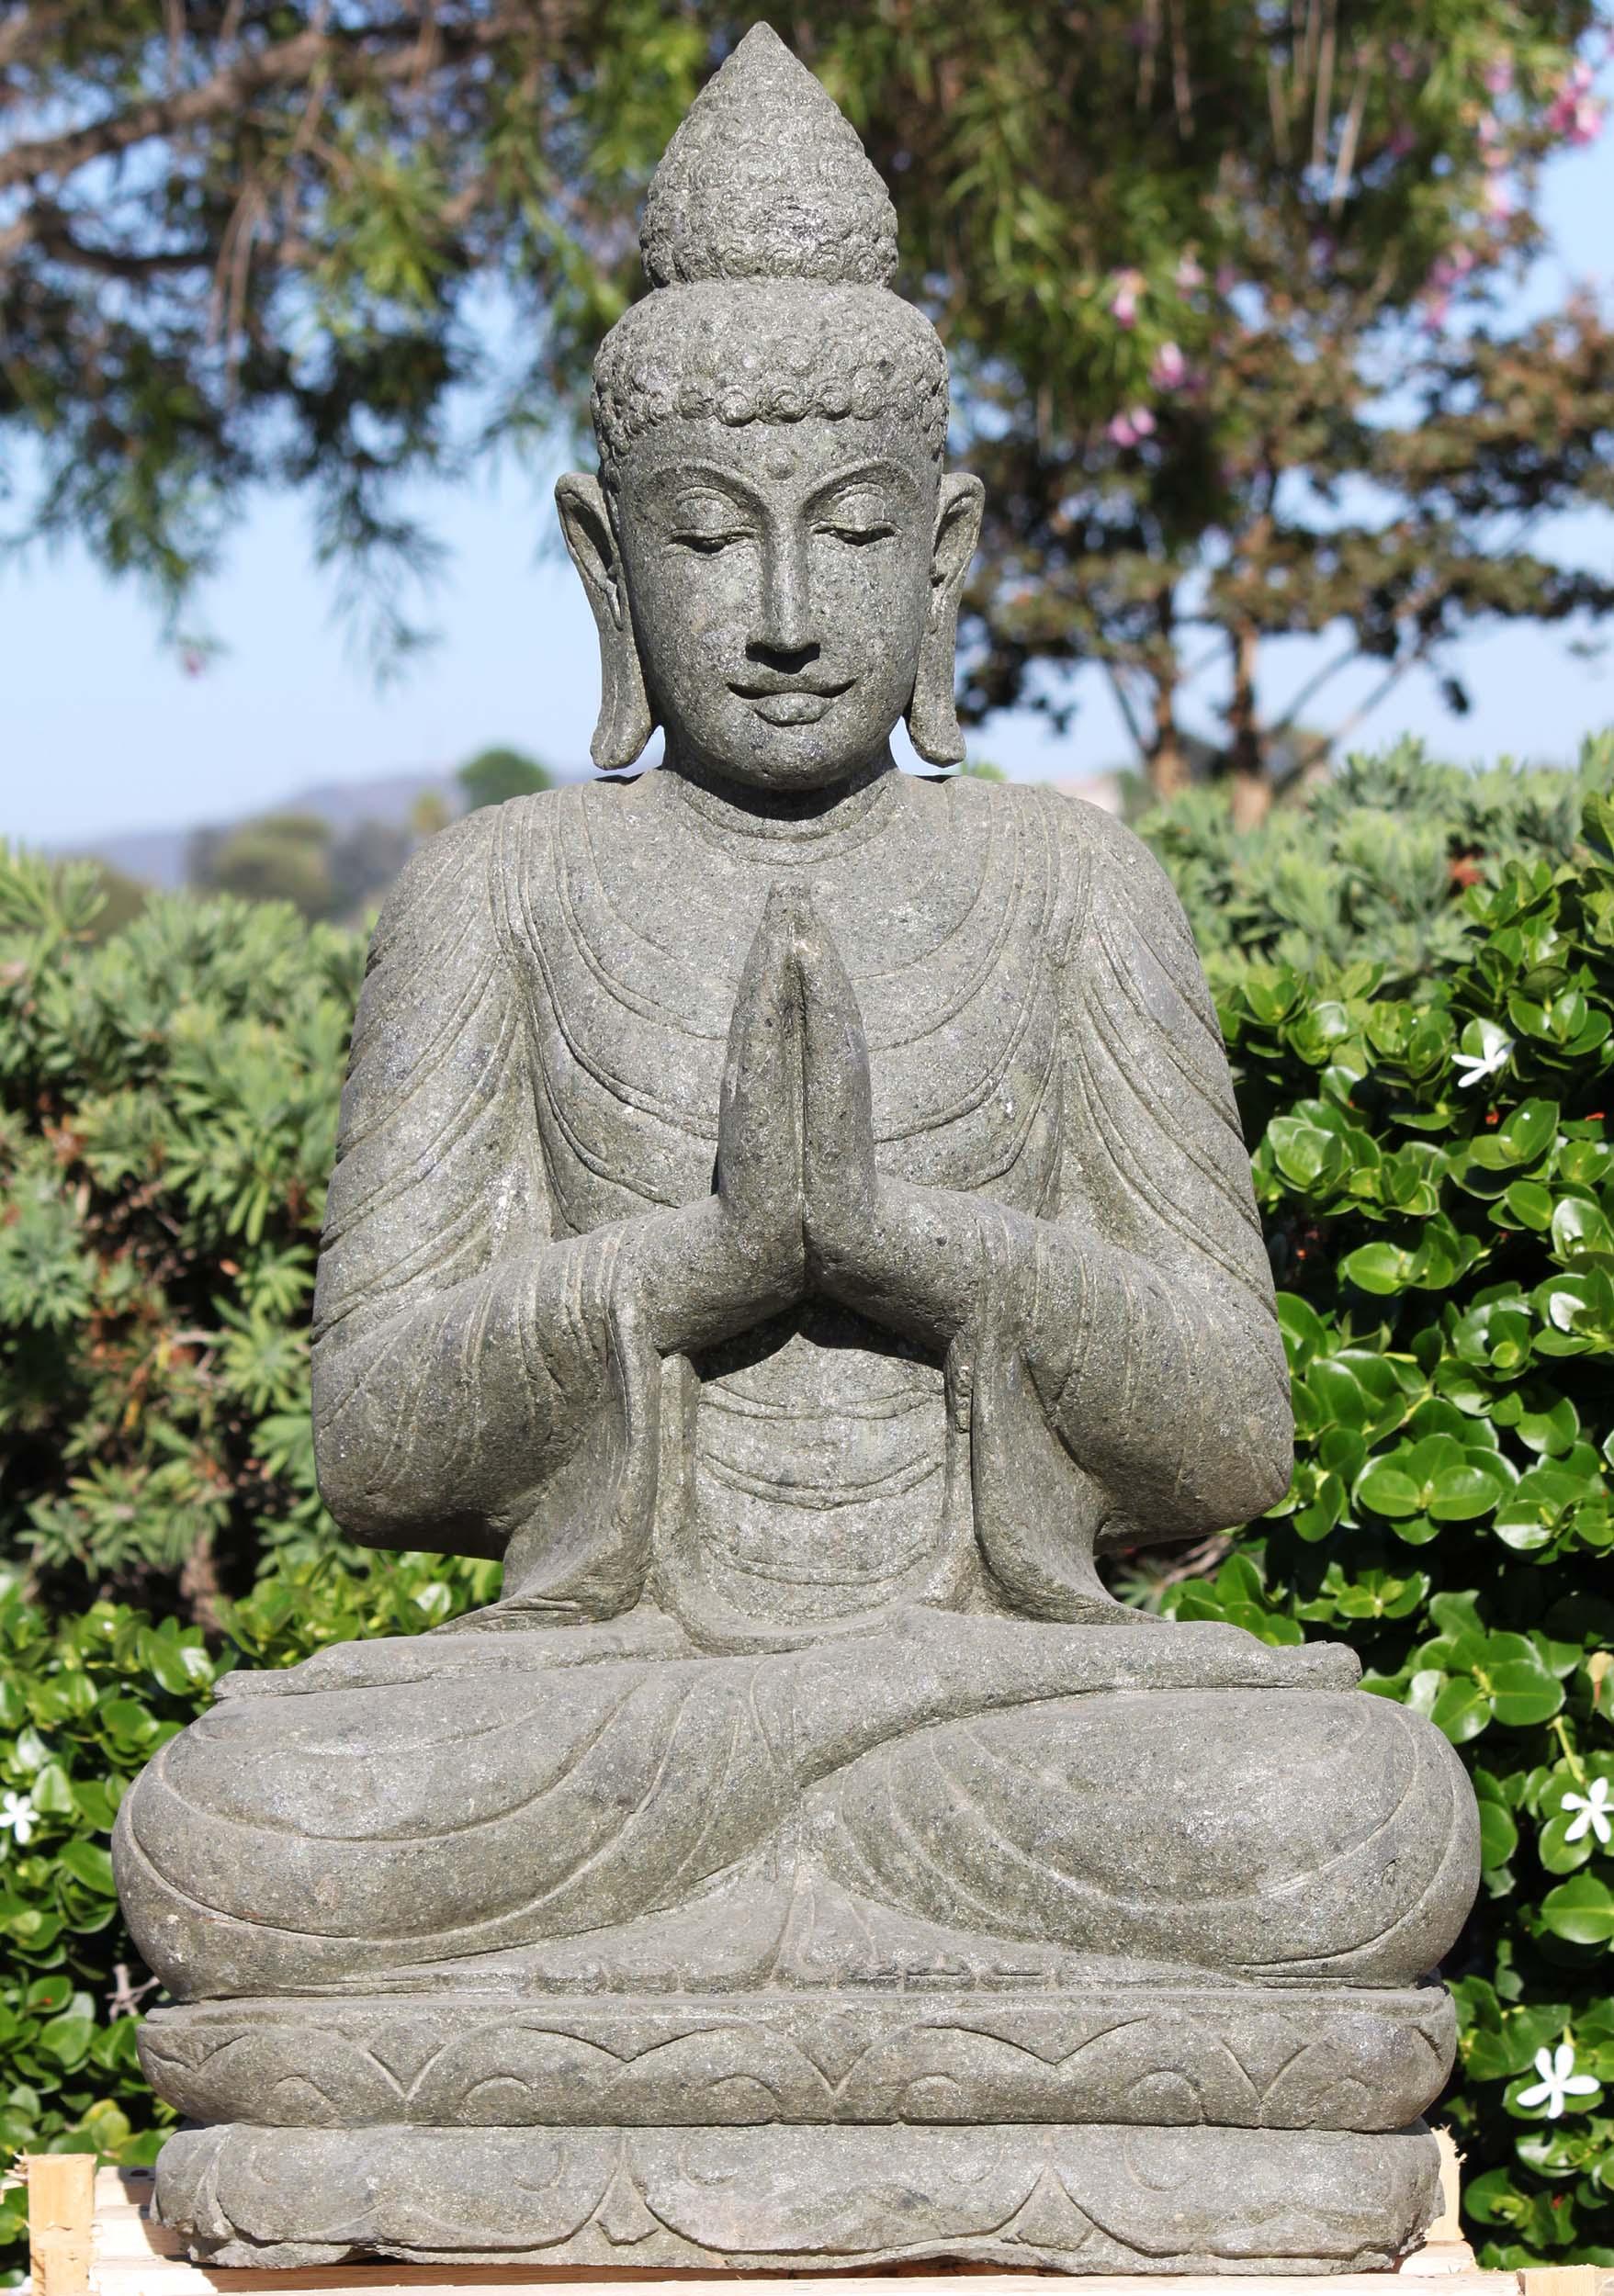 Sold Stone Namaste Buddha Garden Sculpture 40 116ls607 Hindu Gods Buddha Statues